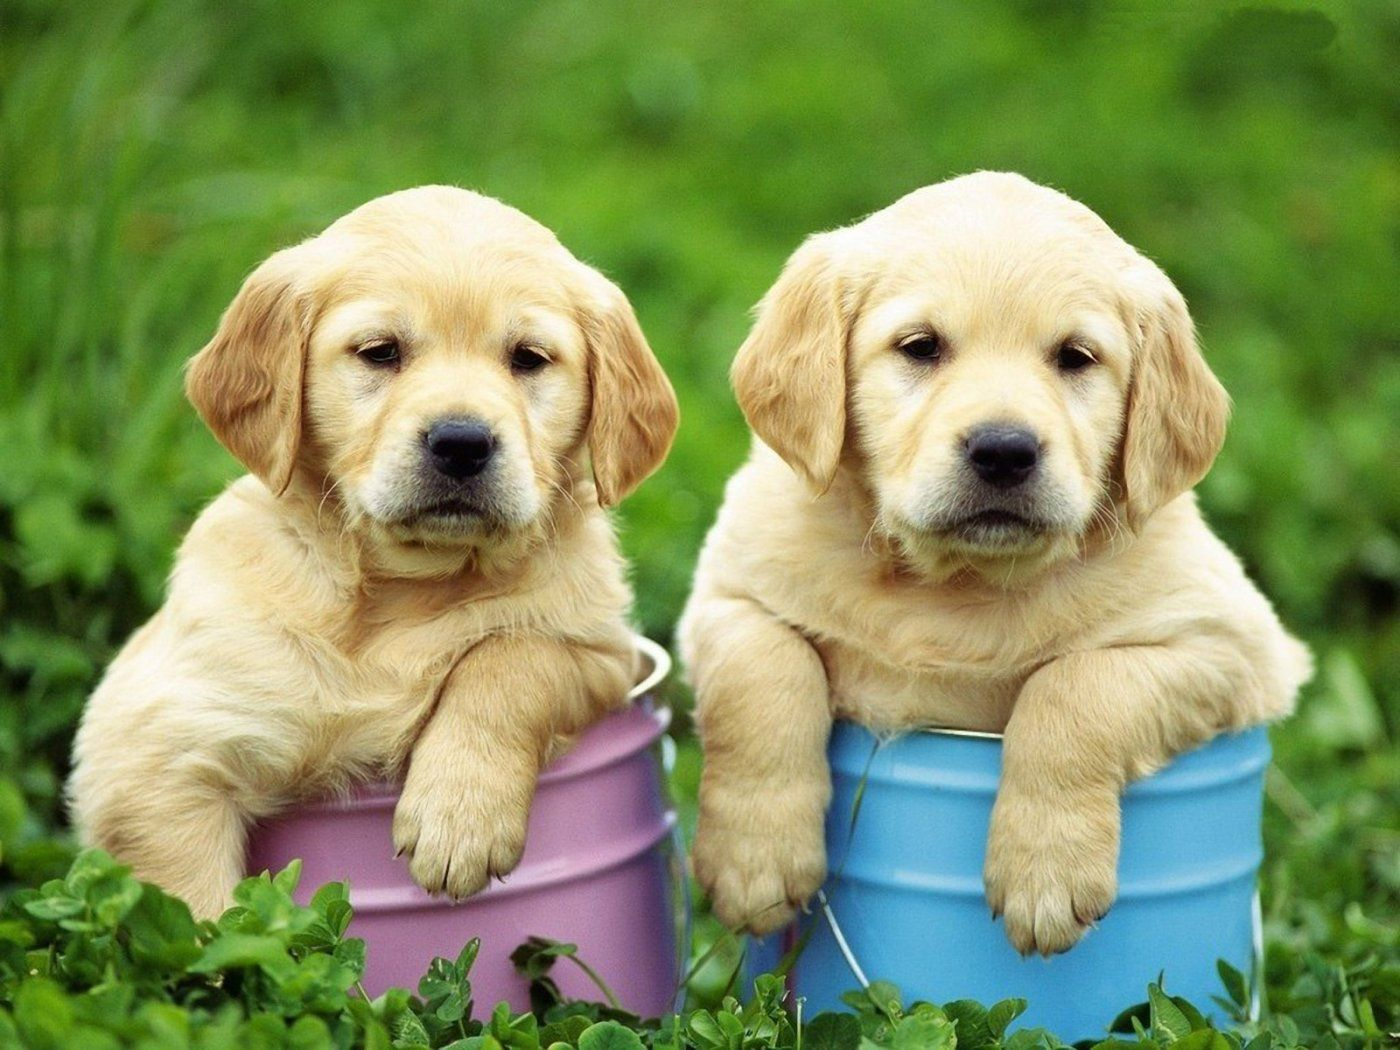 Cute golden retriever puppies in snow wallpaper cute - Cute golden retriever wallpaper ...